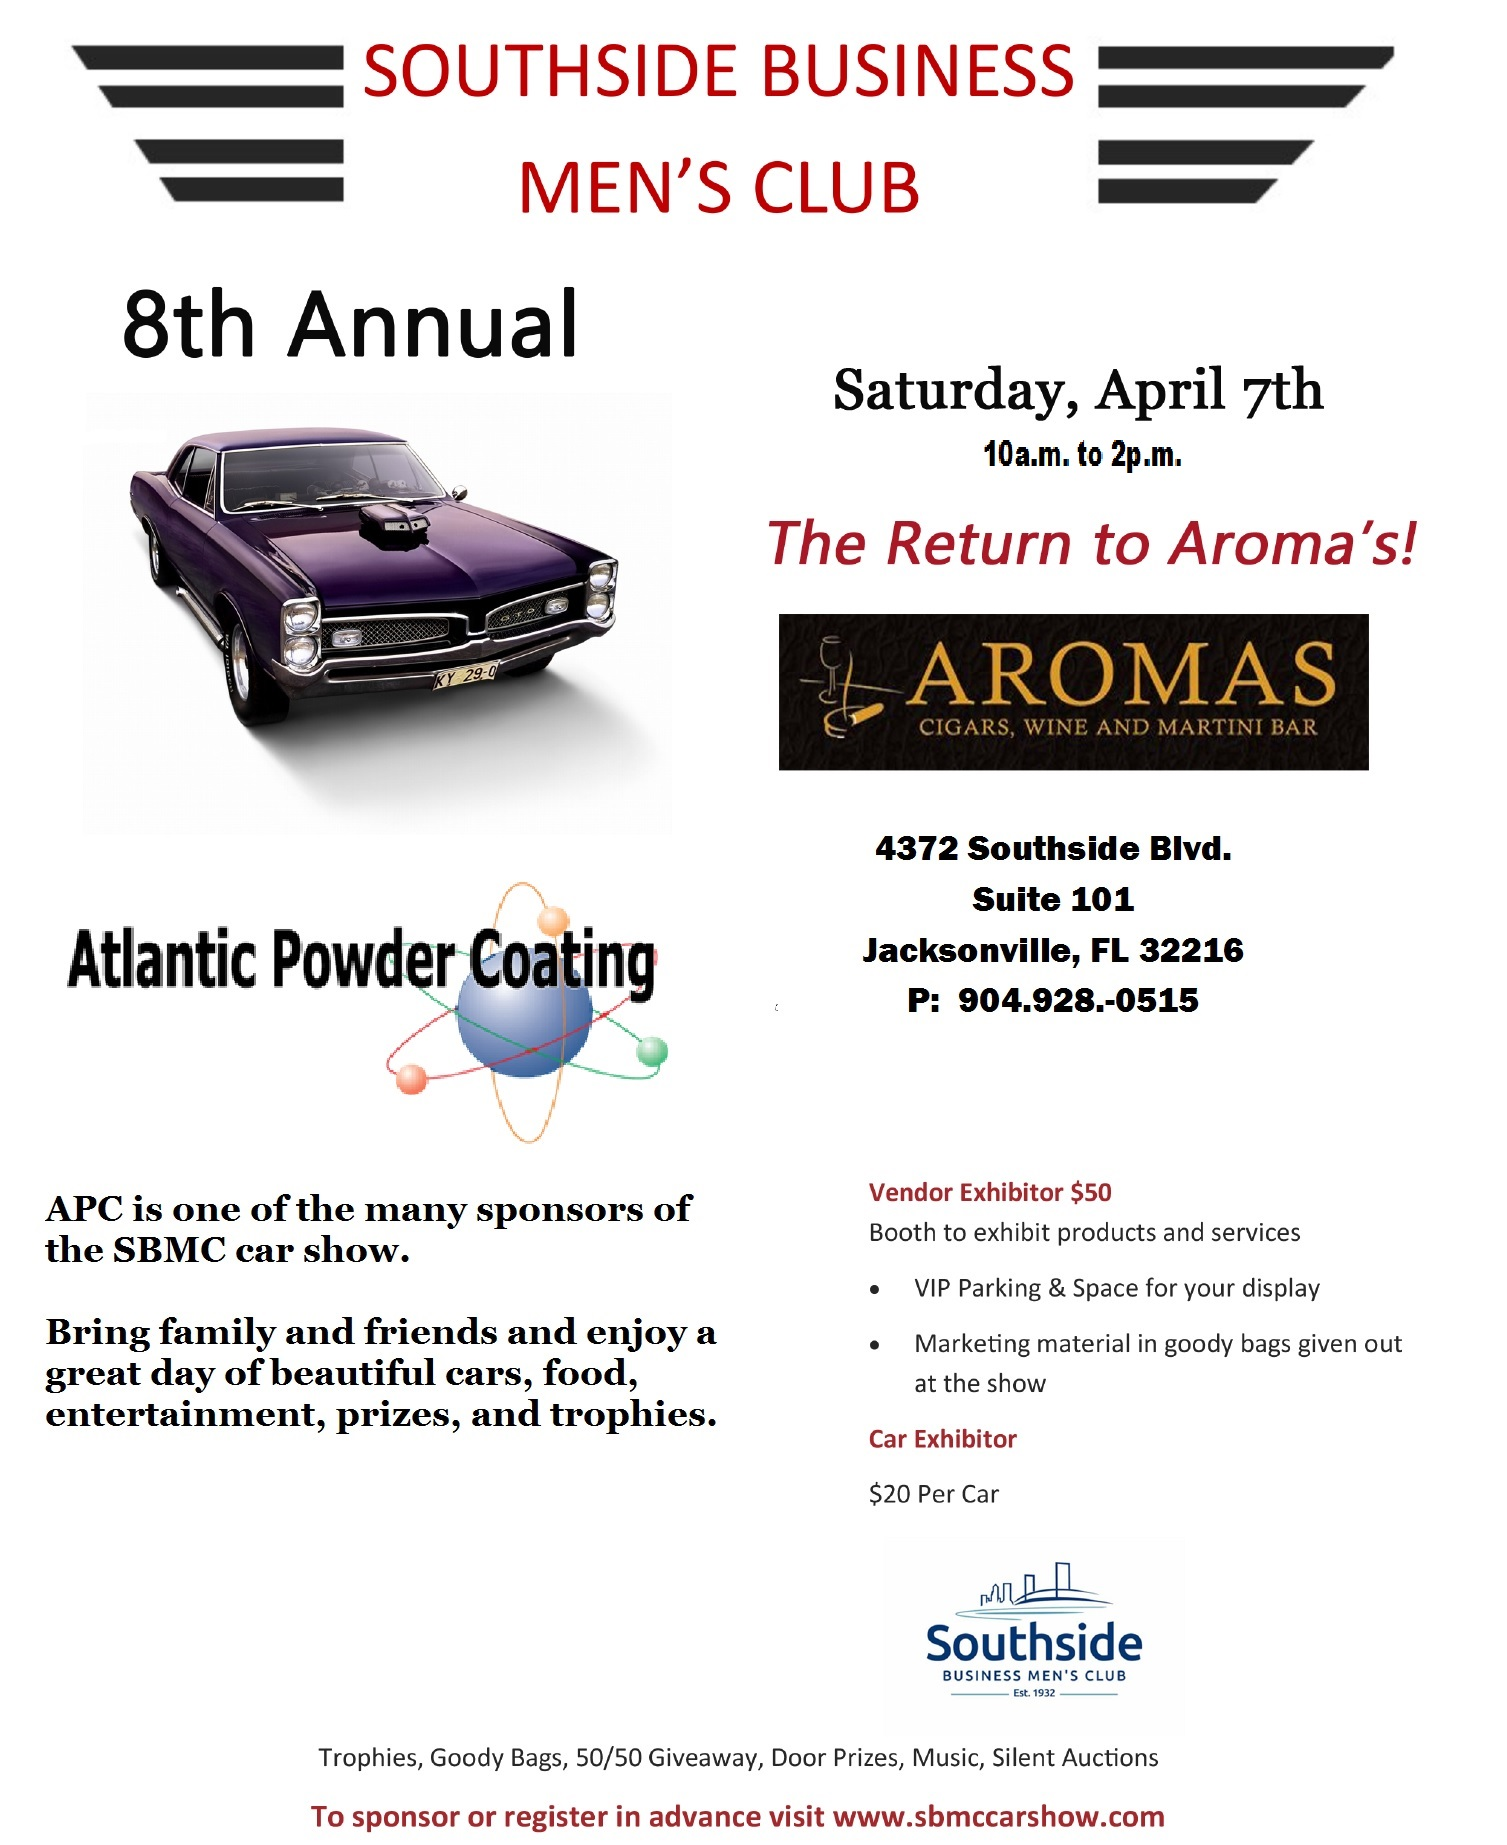 8th Annual - Southside Business Men's Club Car Show